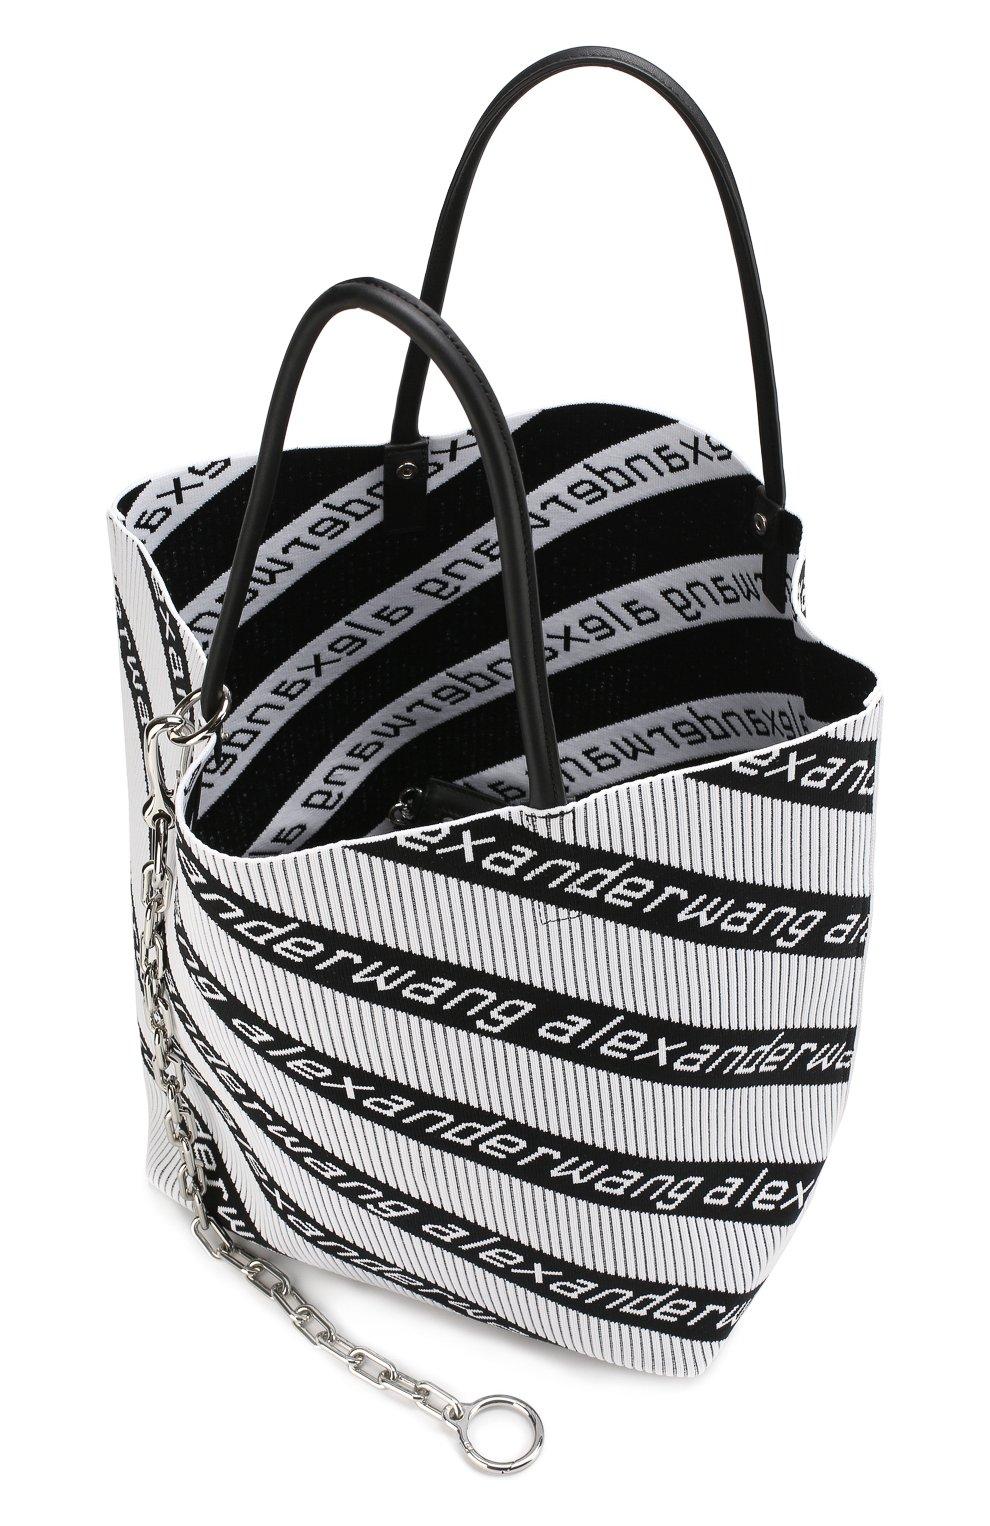 Сумка Roxy  Alexander Wang черно-белая цвета | Фото №4